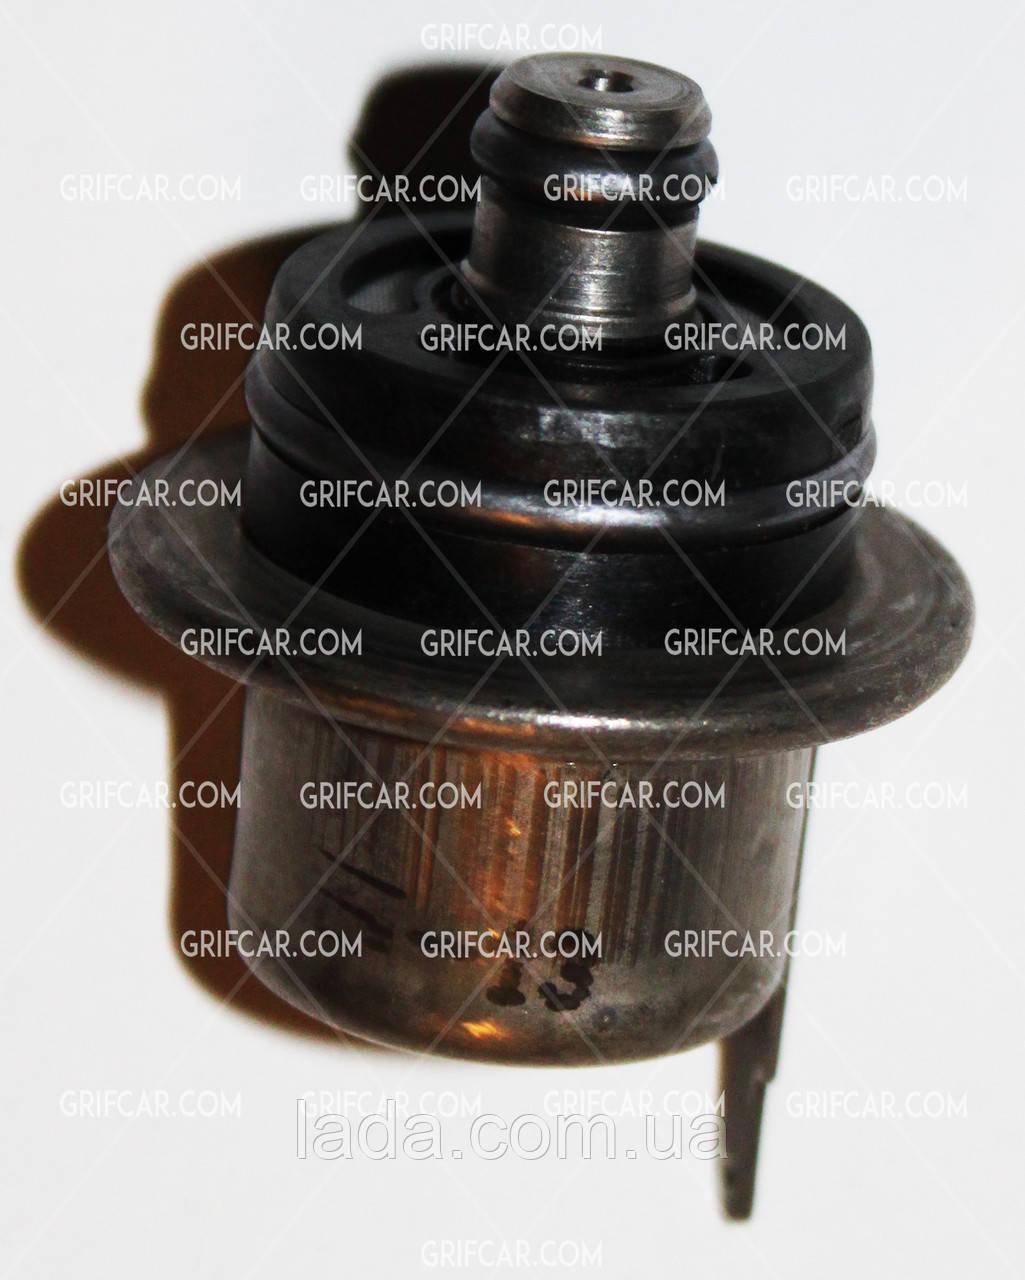 Регулятор давления топлива ВАЗ ВАЗ 1118, ВАЗ 2110, ВАЗ 2170, ВАЗ 2123 УТЕС